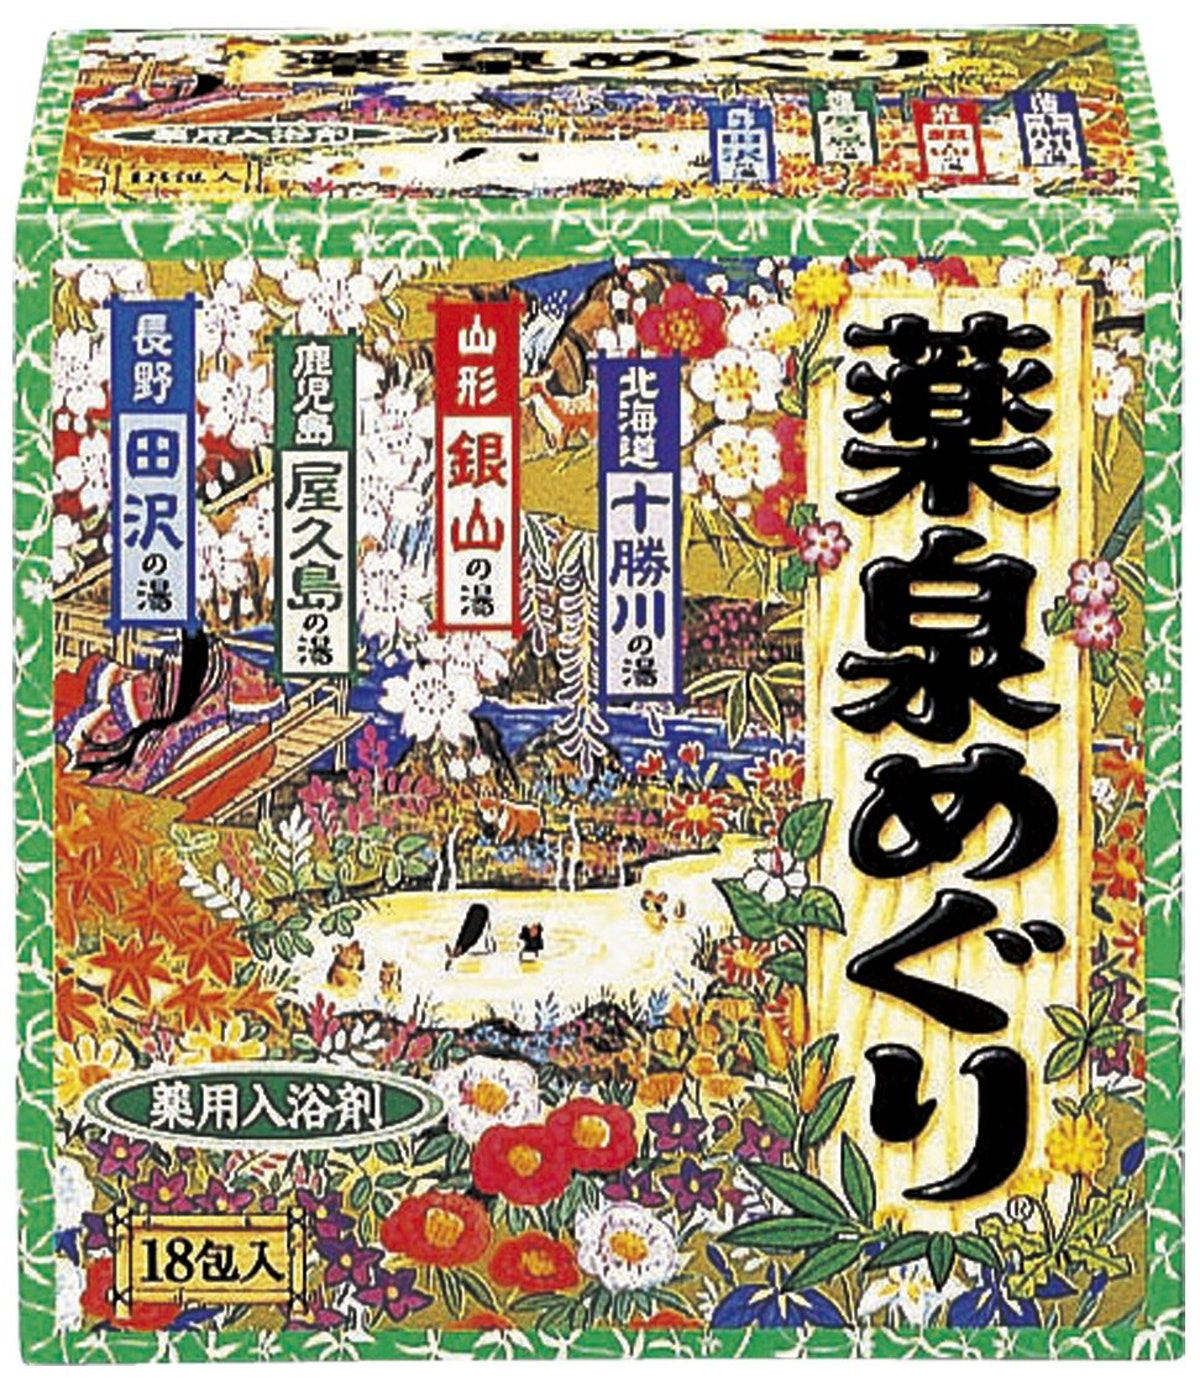 Yumeguri Japanese Hot Spring Bath Powders